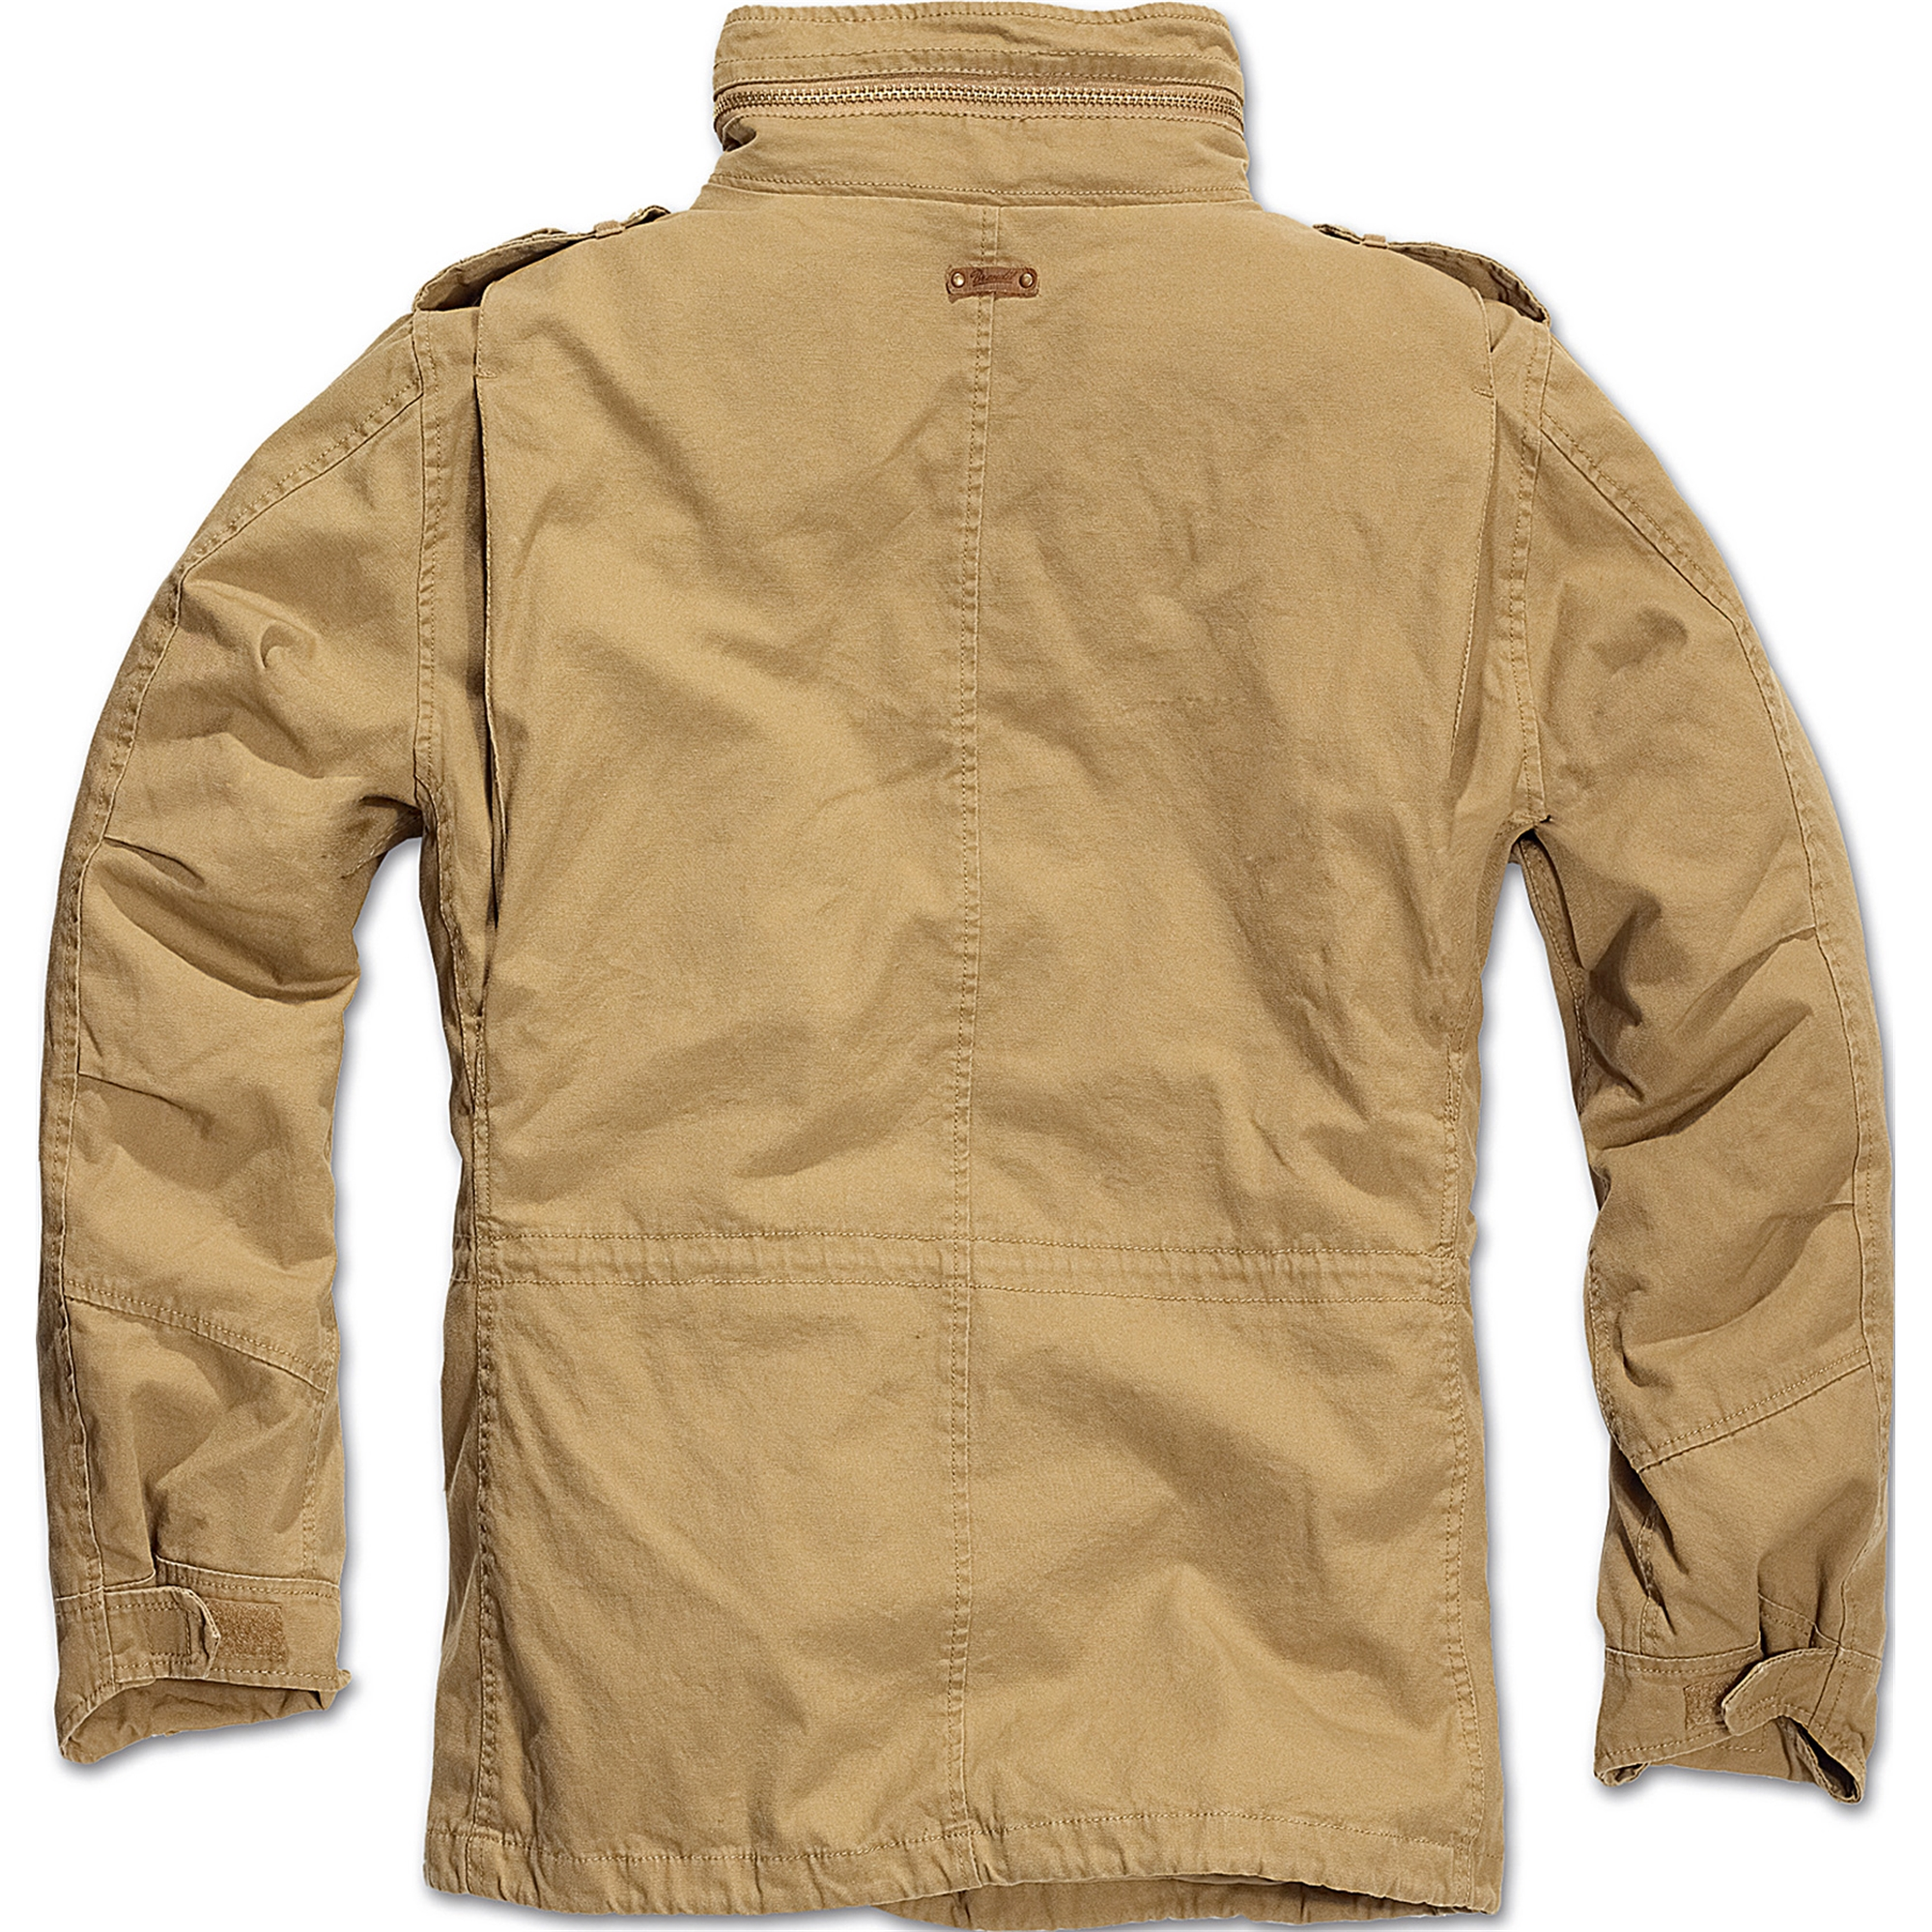 Brandit-M65-Giant-Herren-Jacke-Vintage-Feldjacke-Army-Outdoor-Parka-Futter-S-7XL Indexbild 13